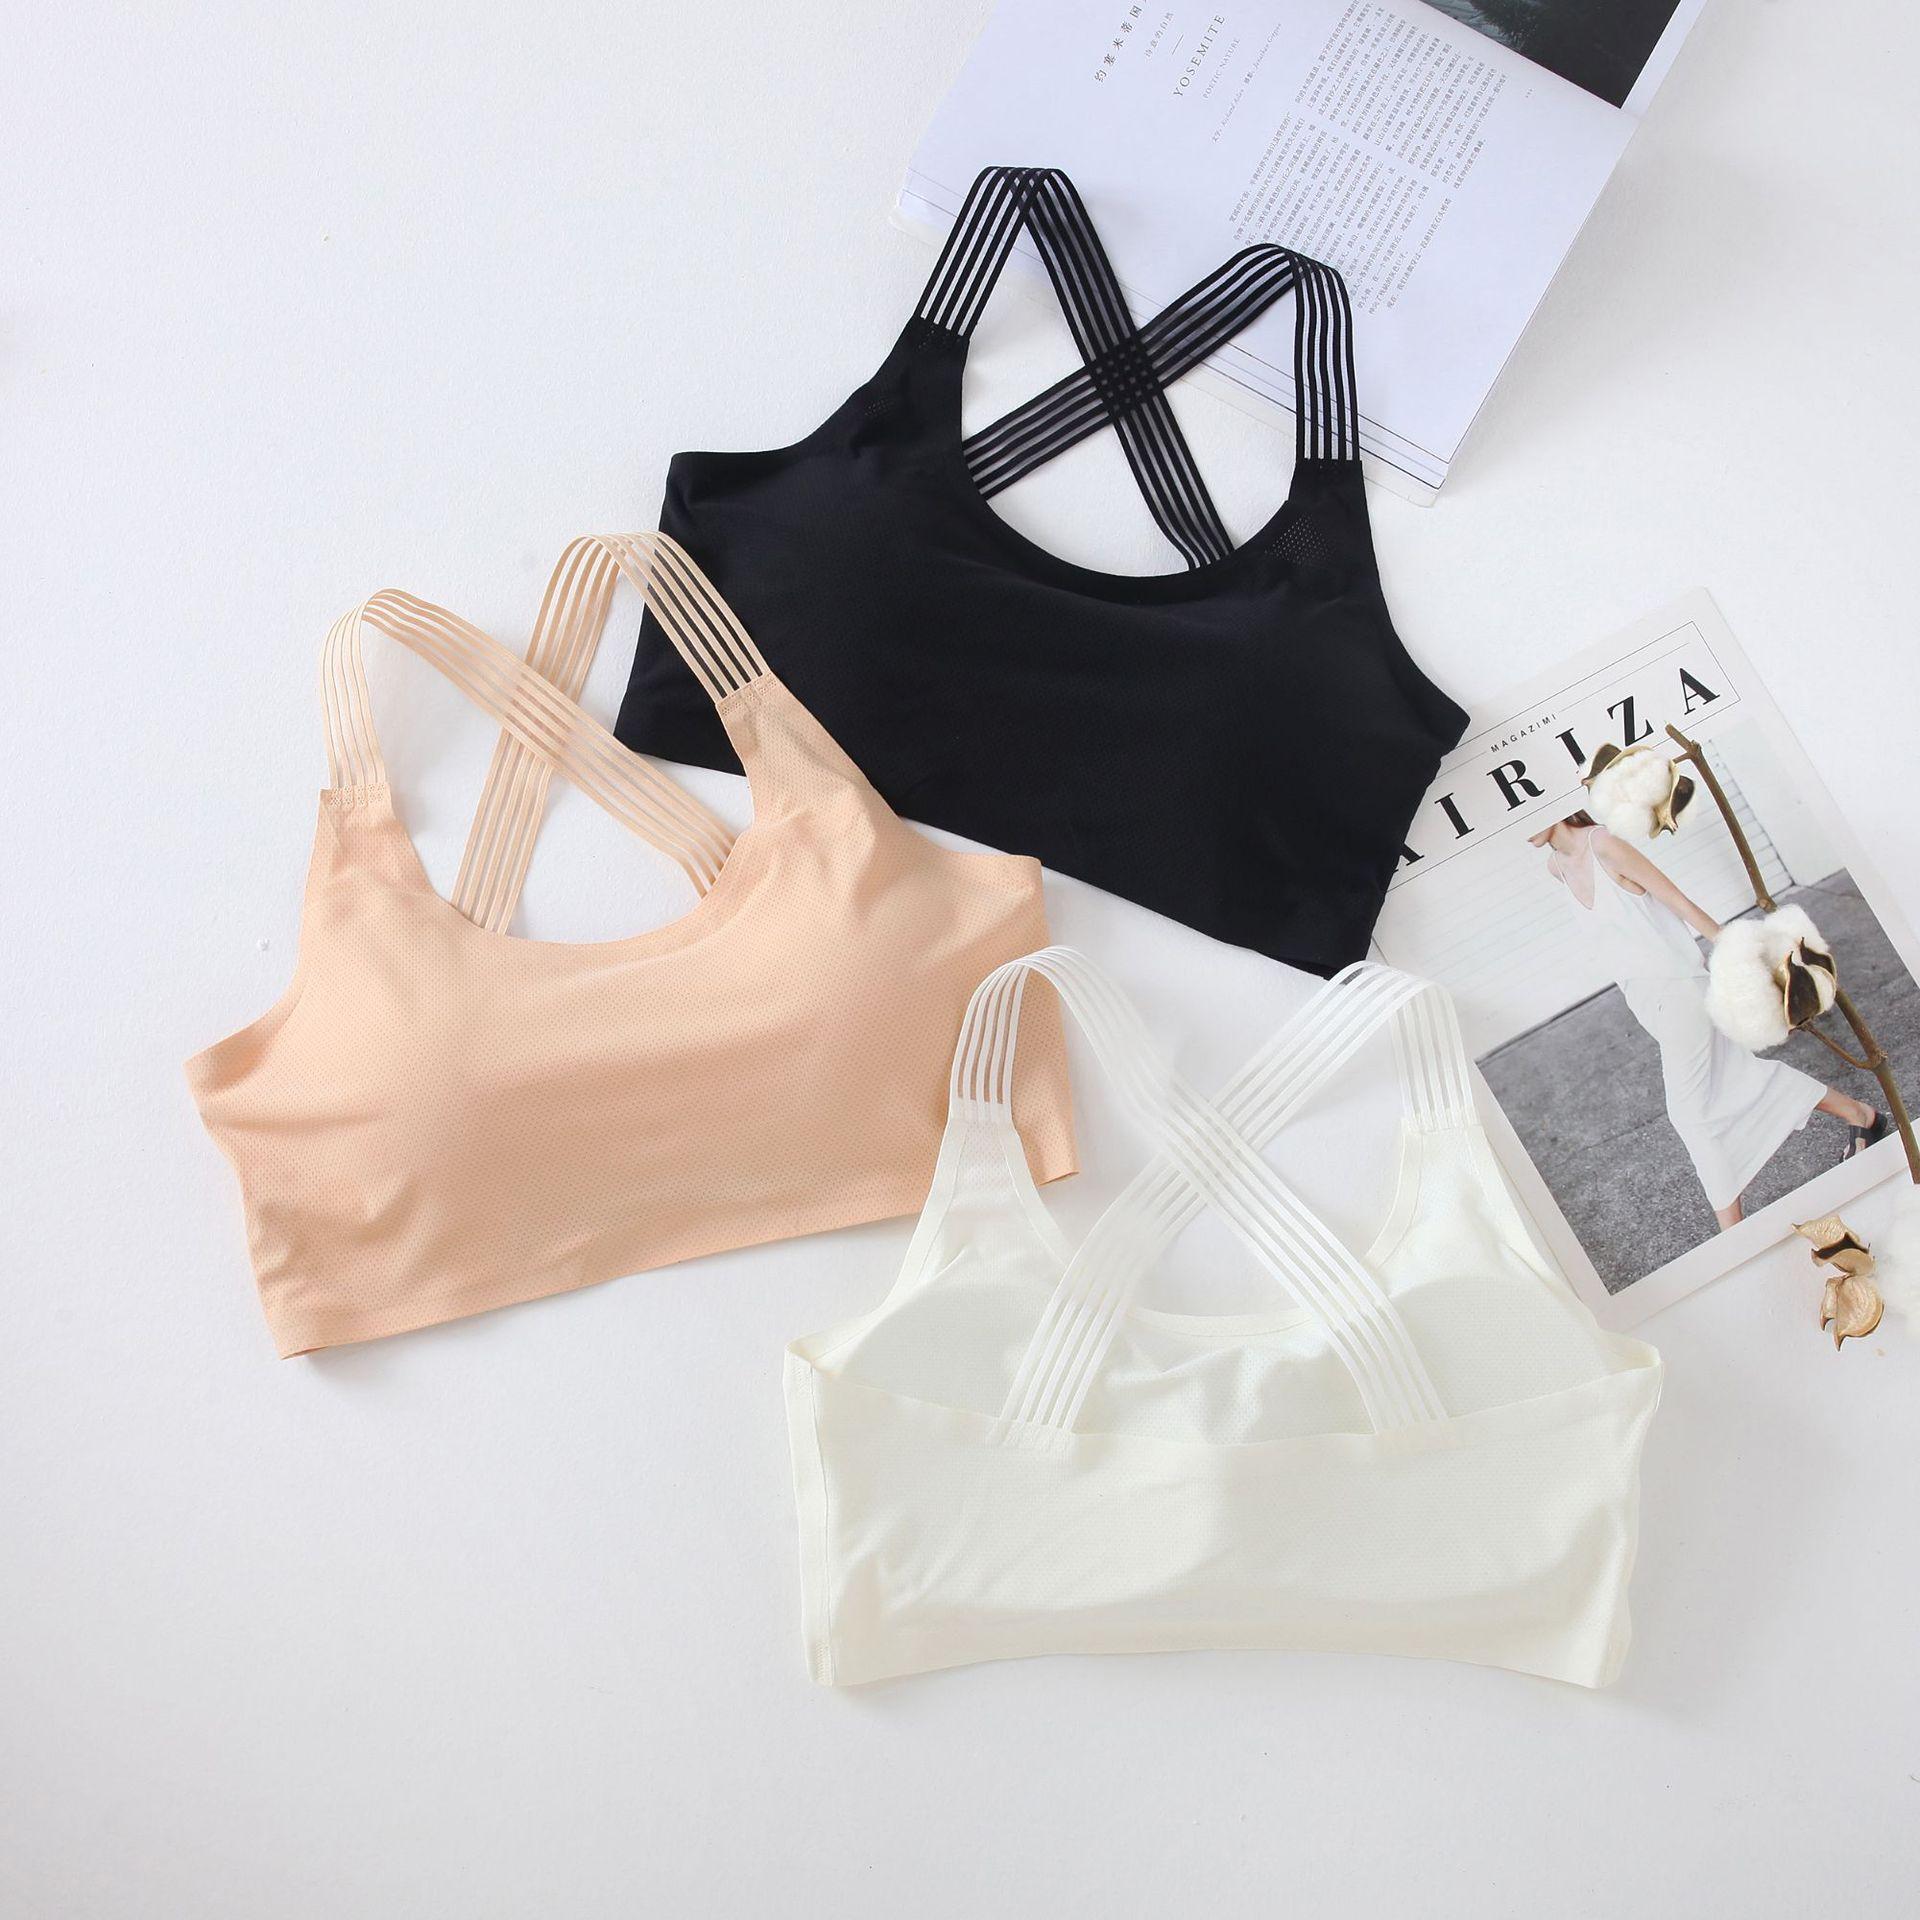 Women Yoga Sport Bra Shockproof Sexy Back Sports Bras Breathable Athletic Fitness Running Gym Vest Tops Sportswear